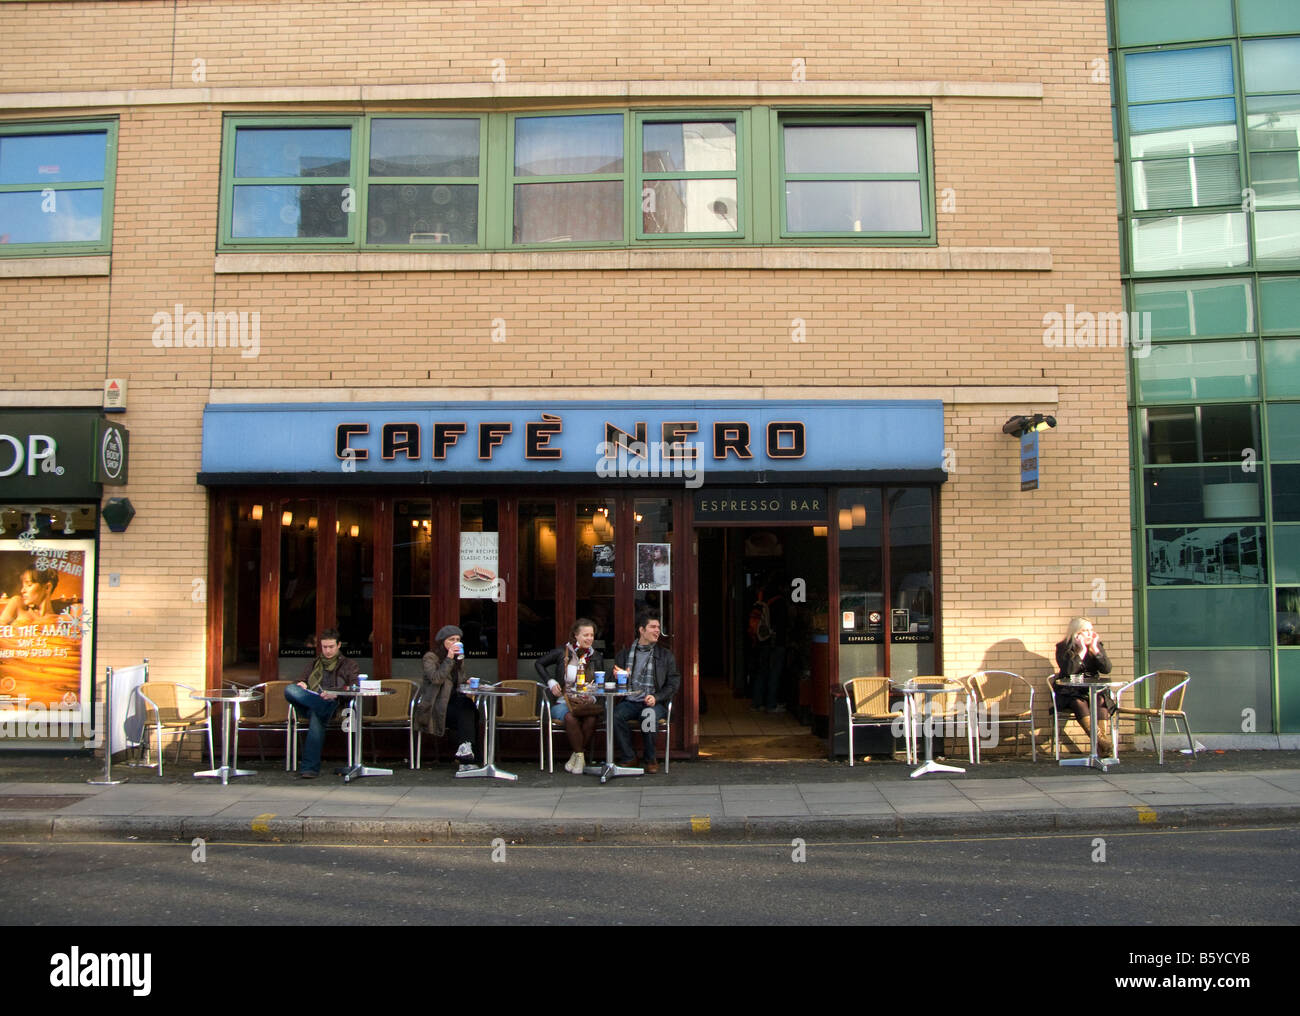 caffe-nero-camden-london-B5YCYB.jpg?profile=RESIZE_400x